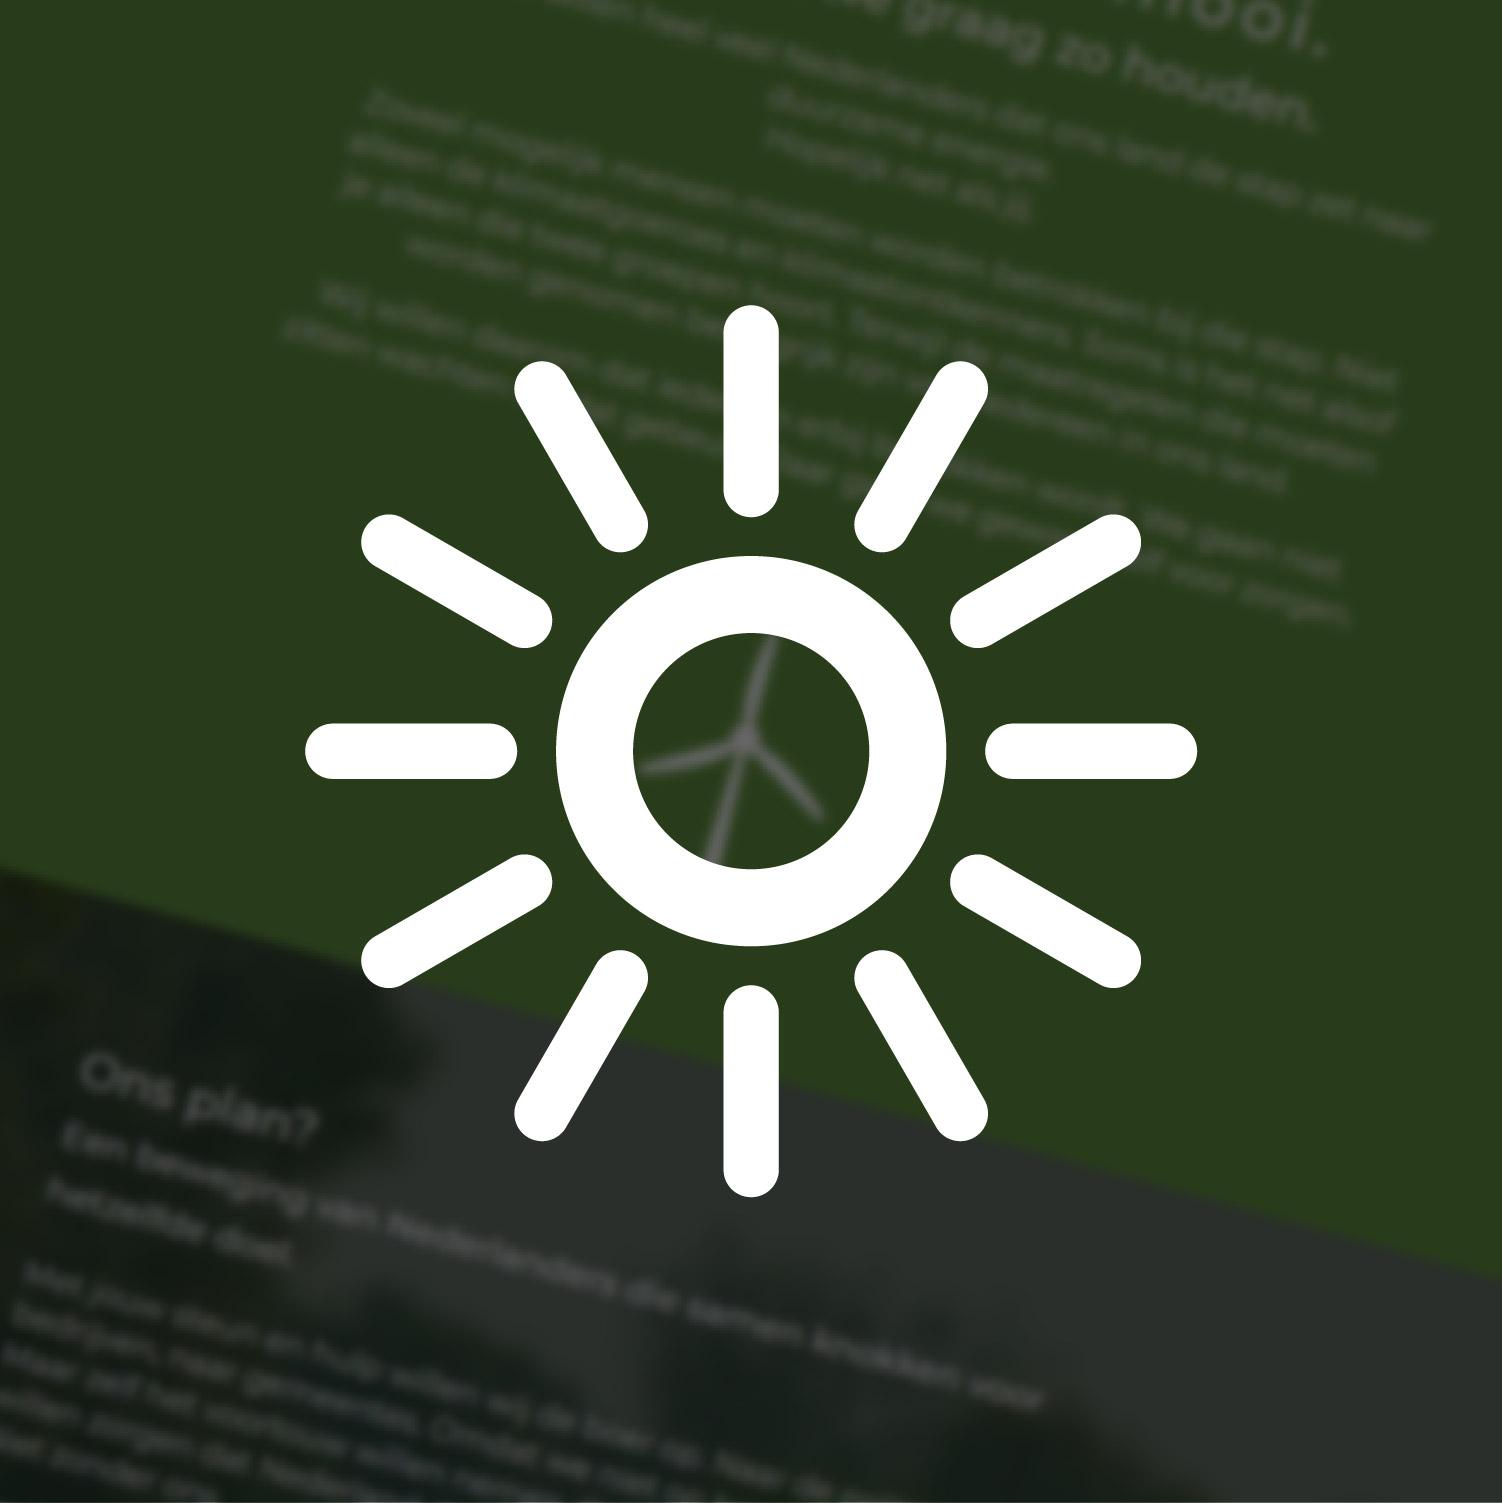 Kies nieuwe energie | Website voor Duurzaamheidscampagne